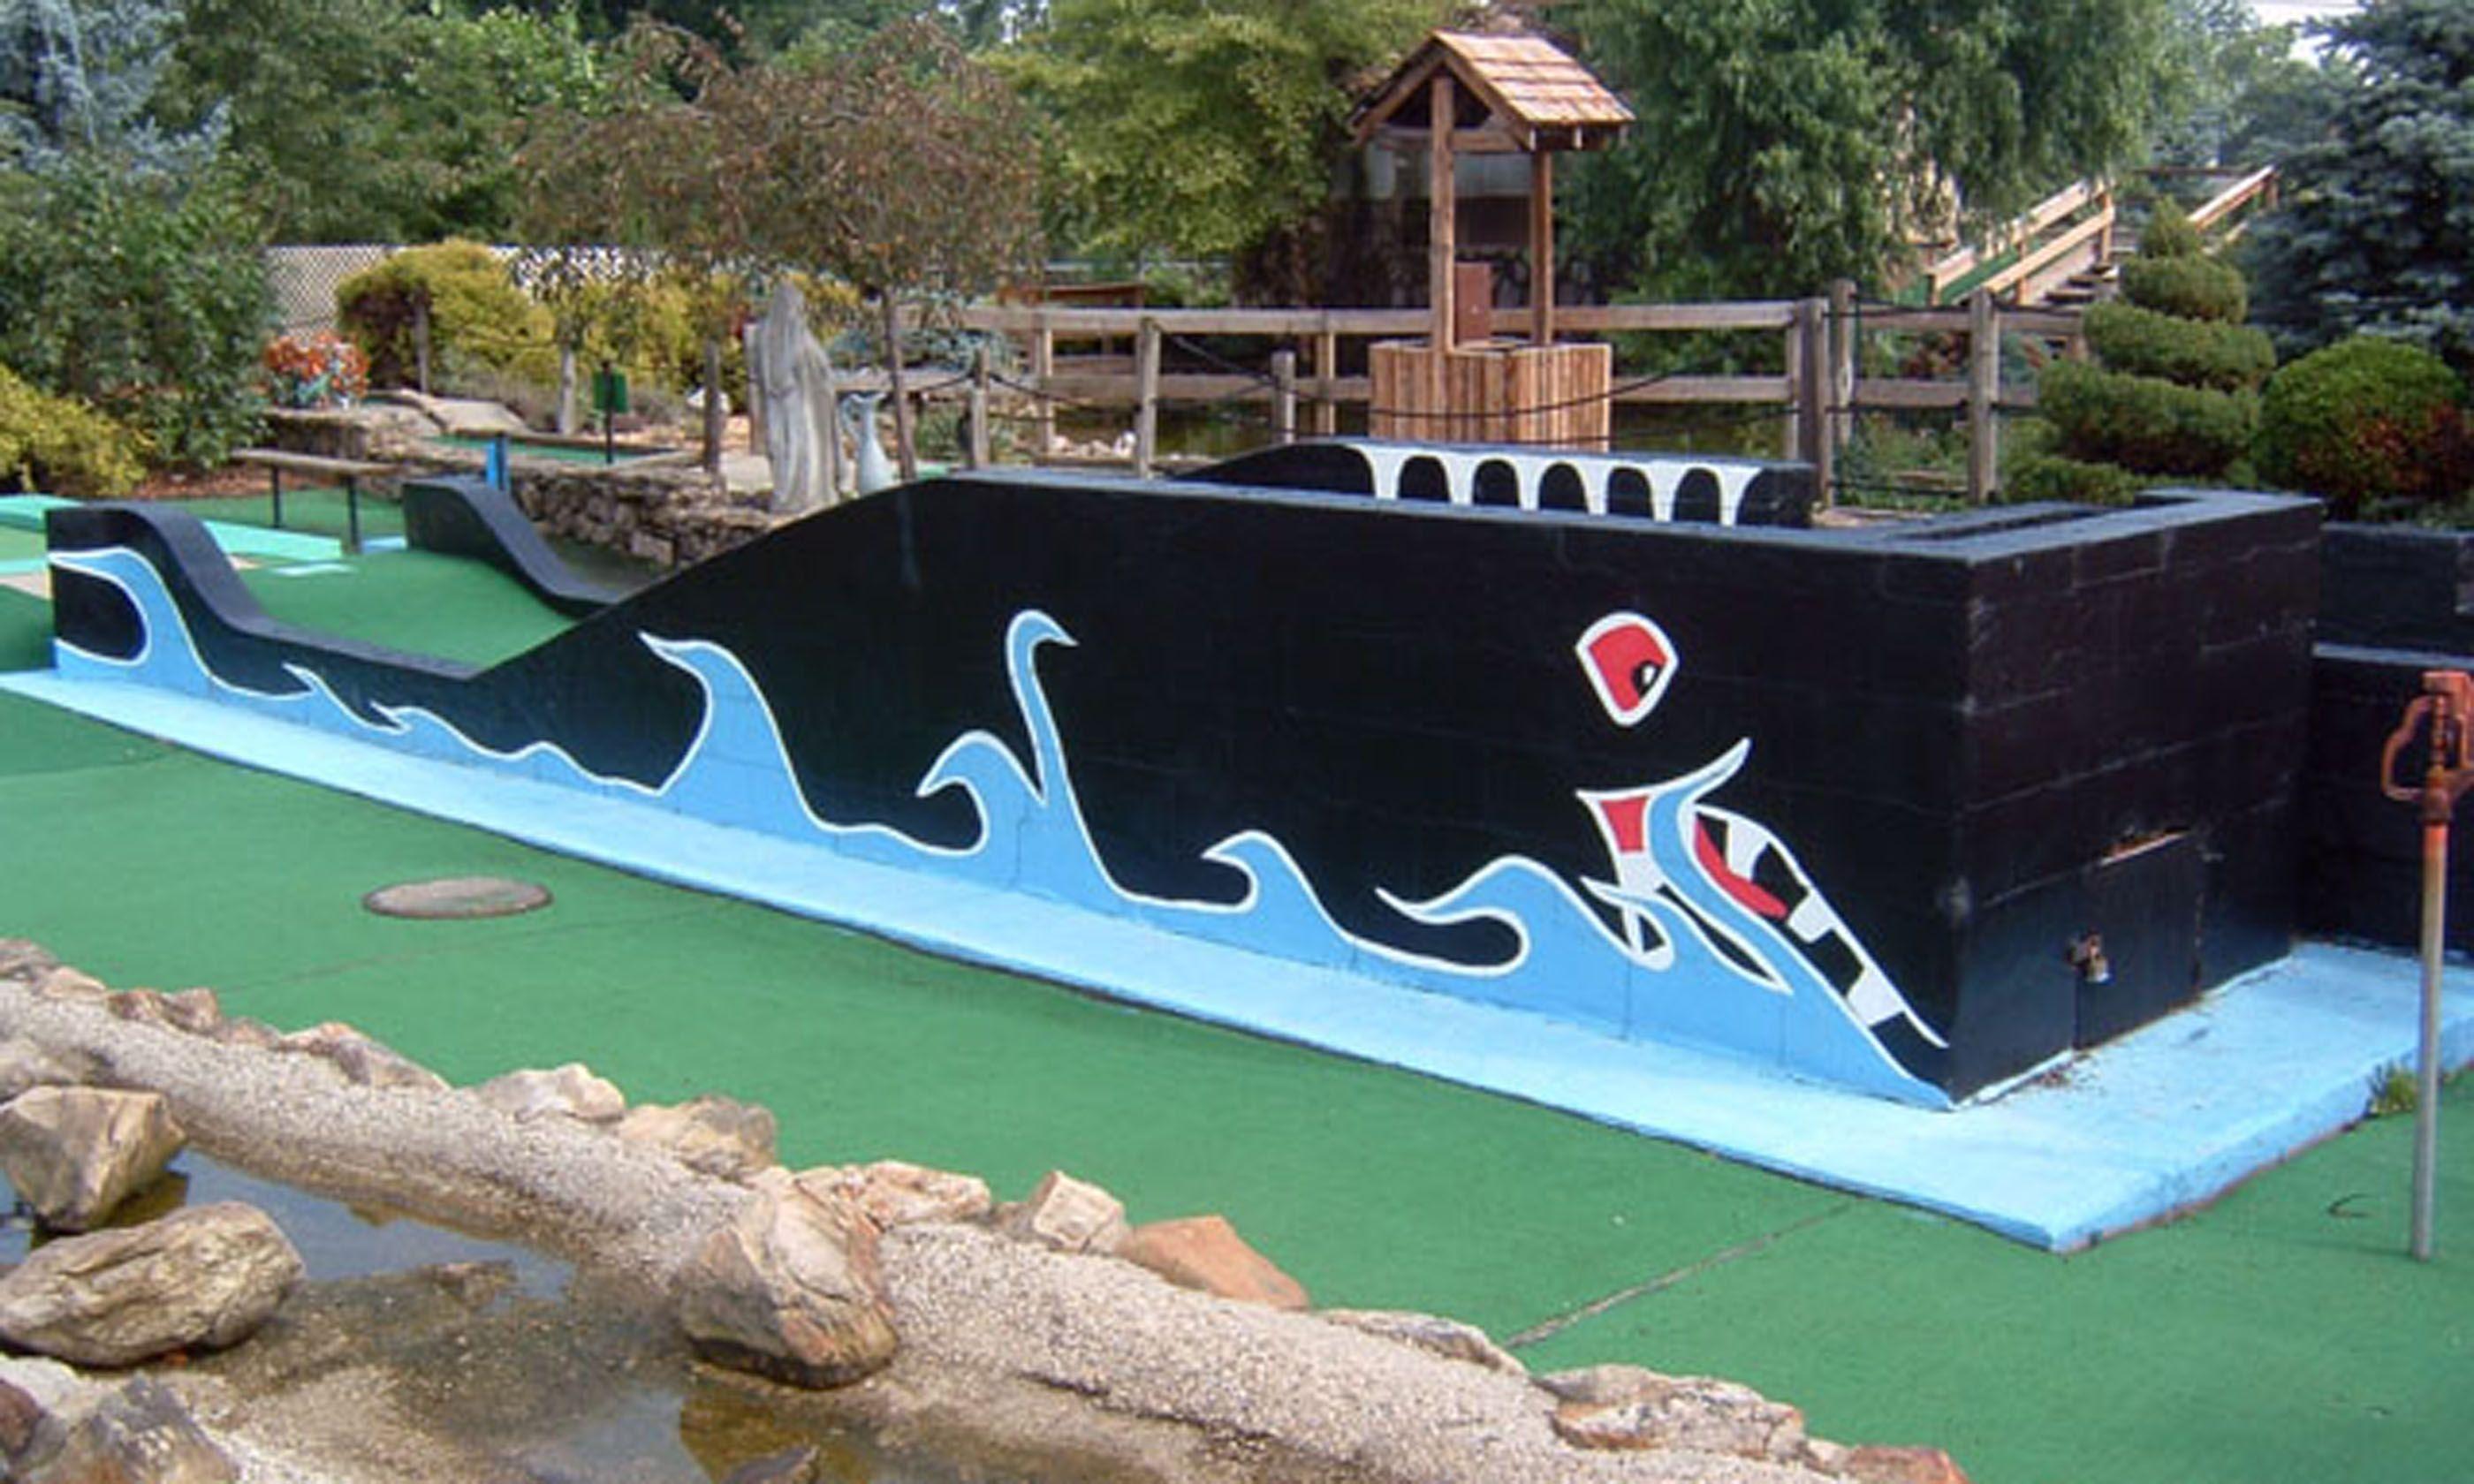 The Jonah and the Whale hole (lexingtoncentre.com)